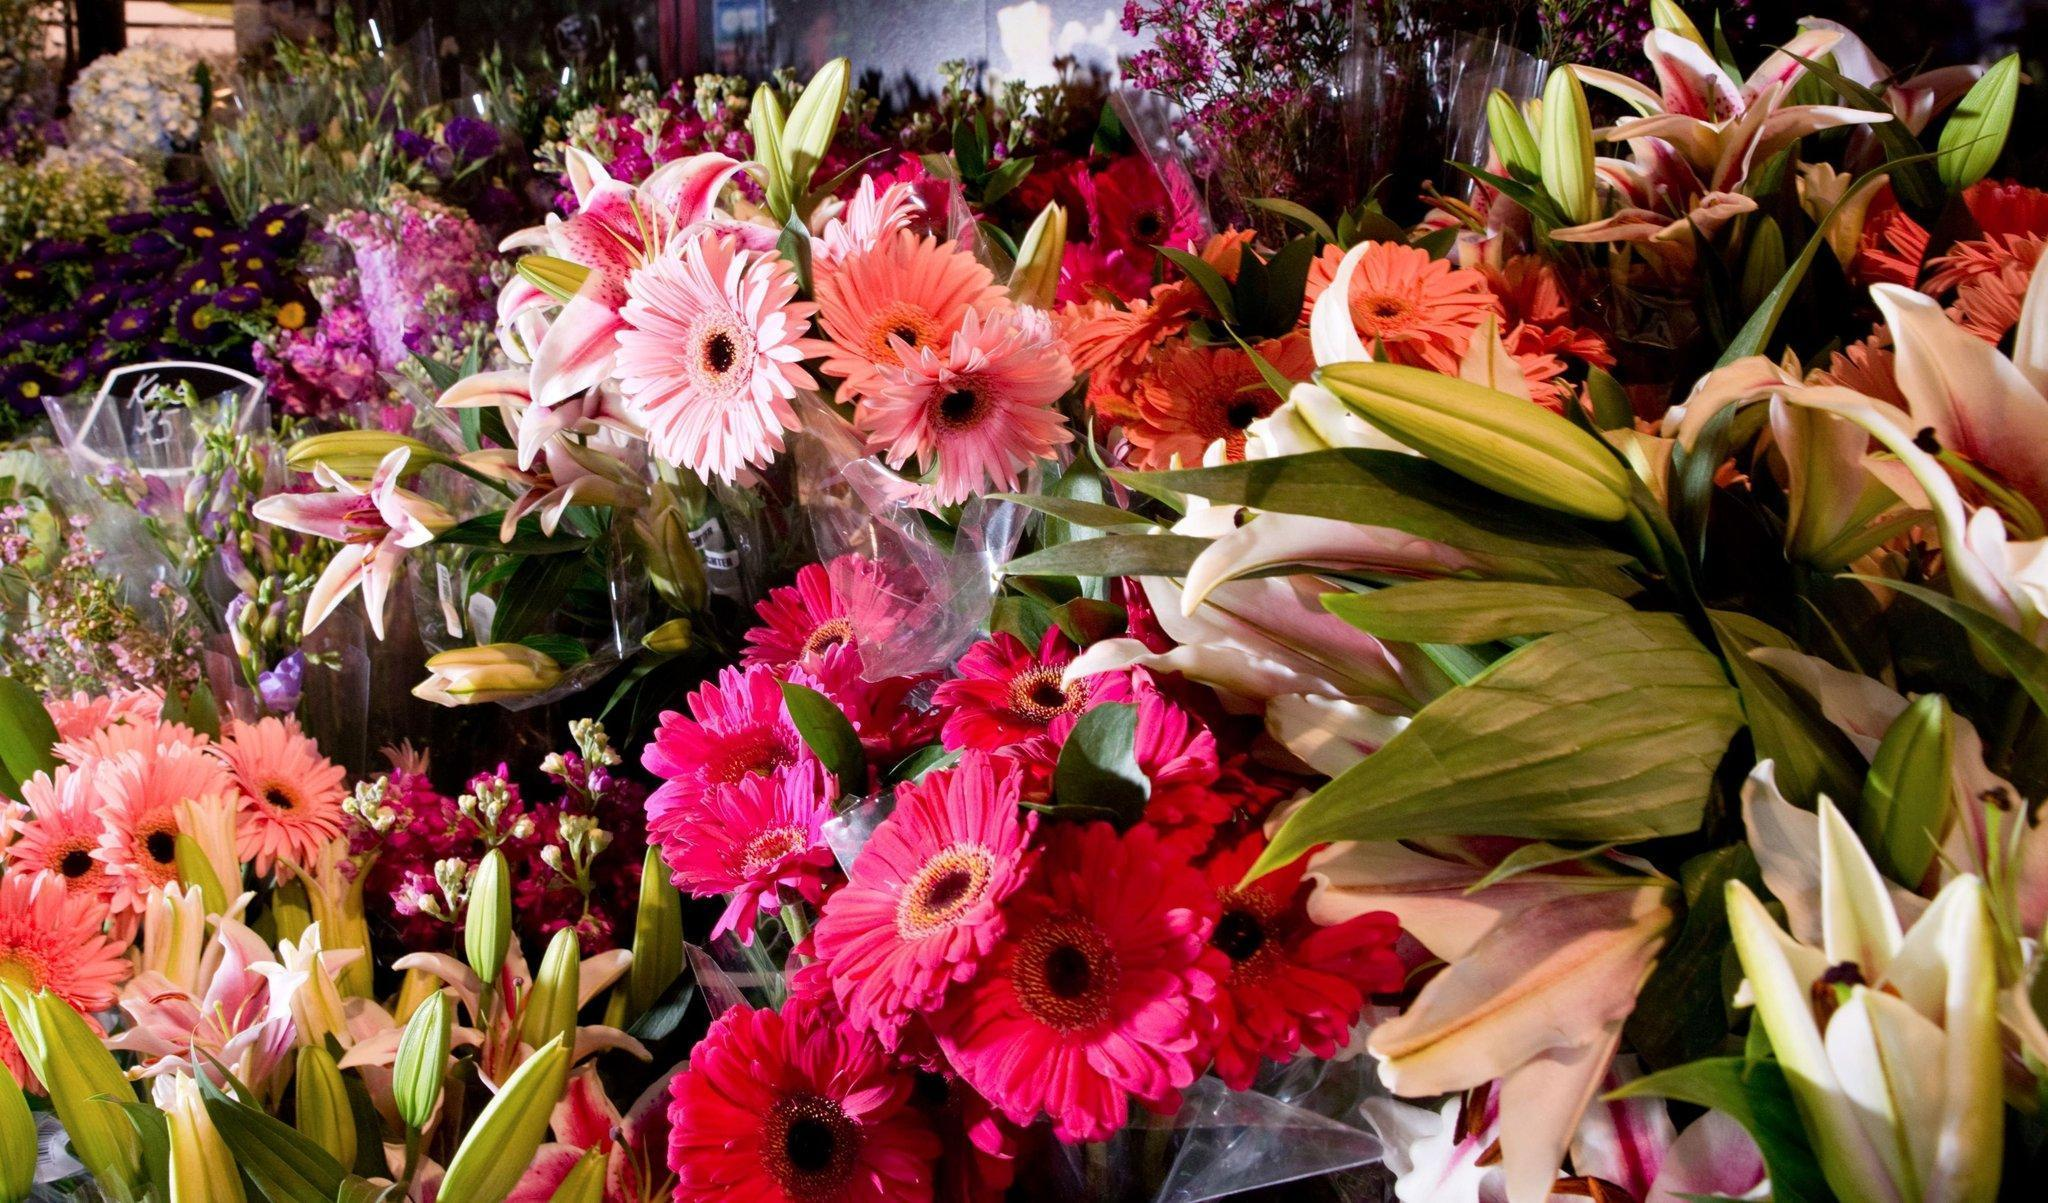 Chicago Flower & Garden Show to bloom with ideas Chicago